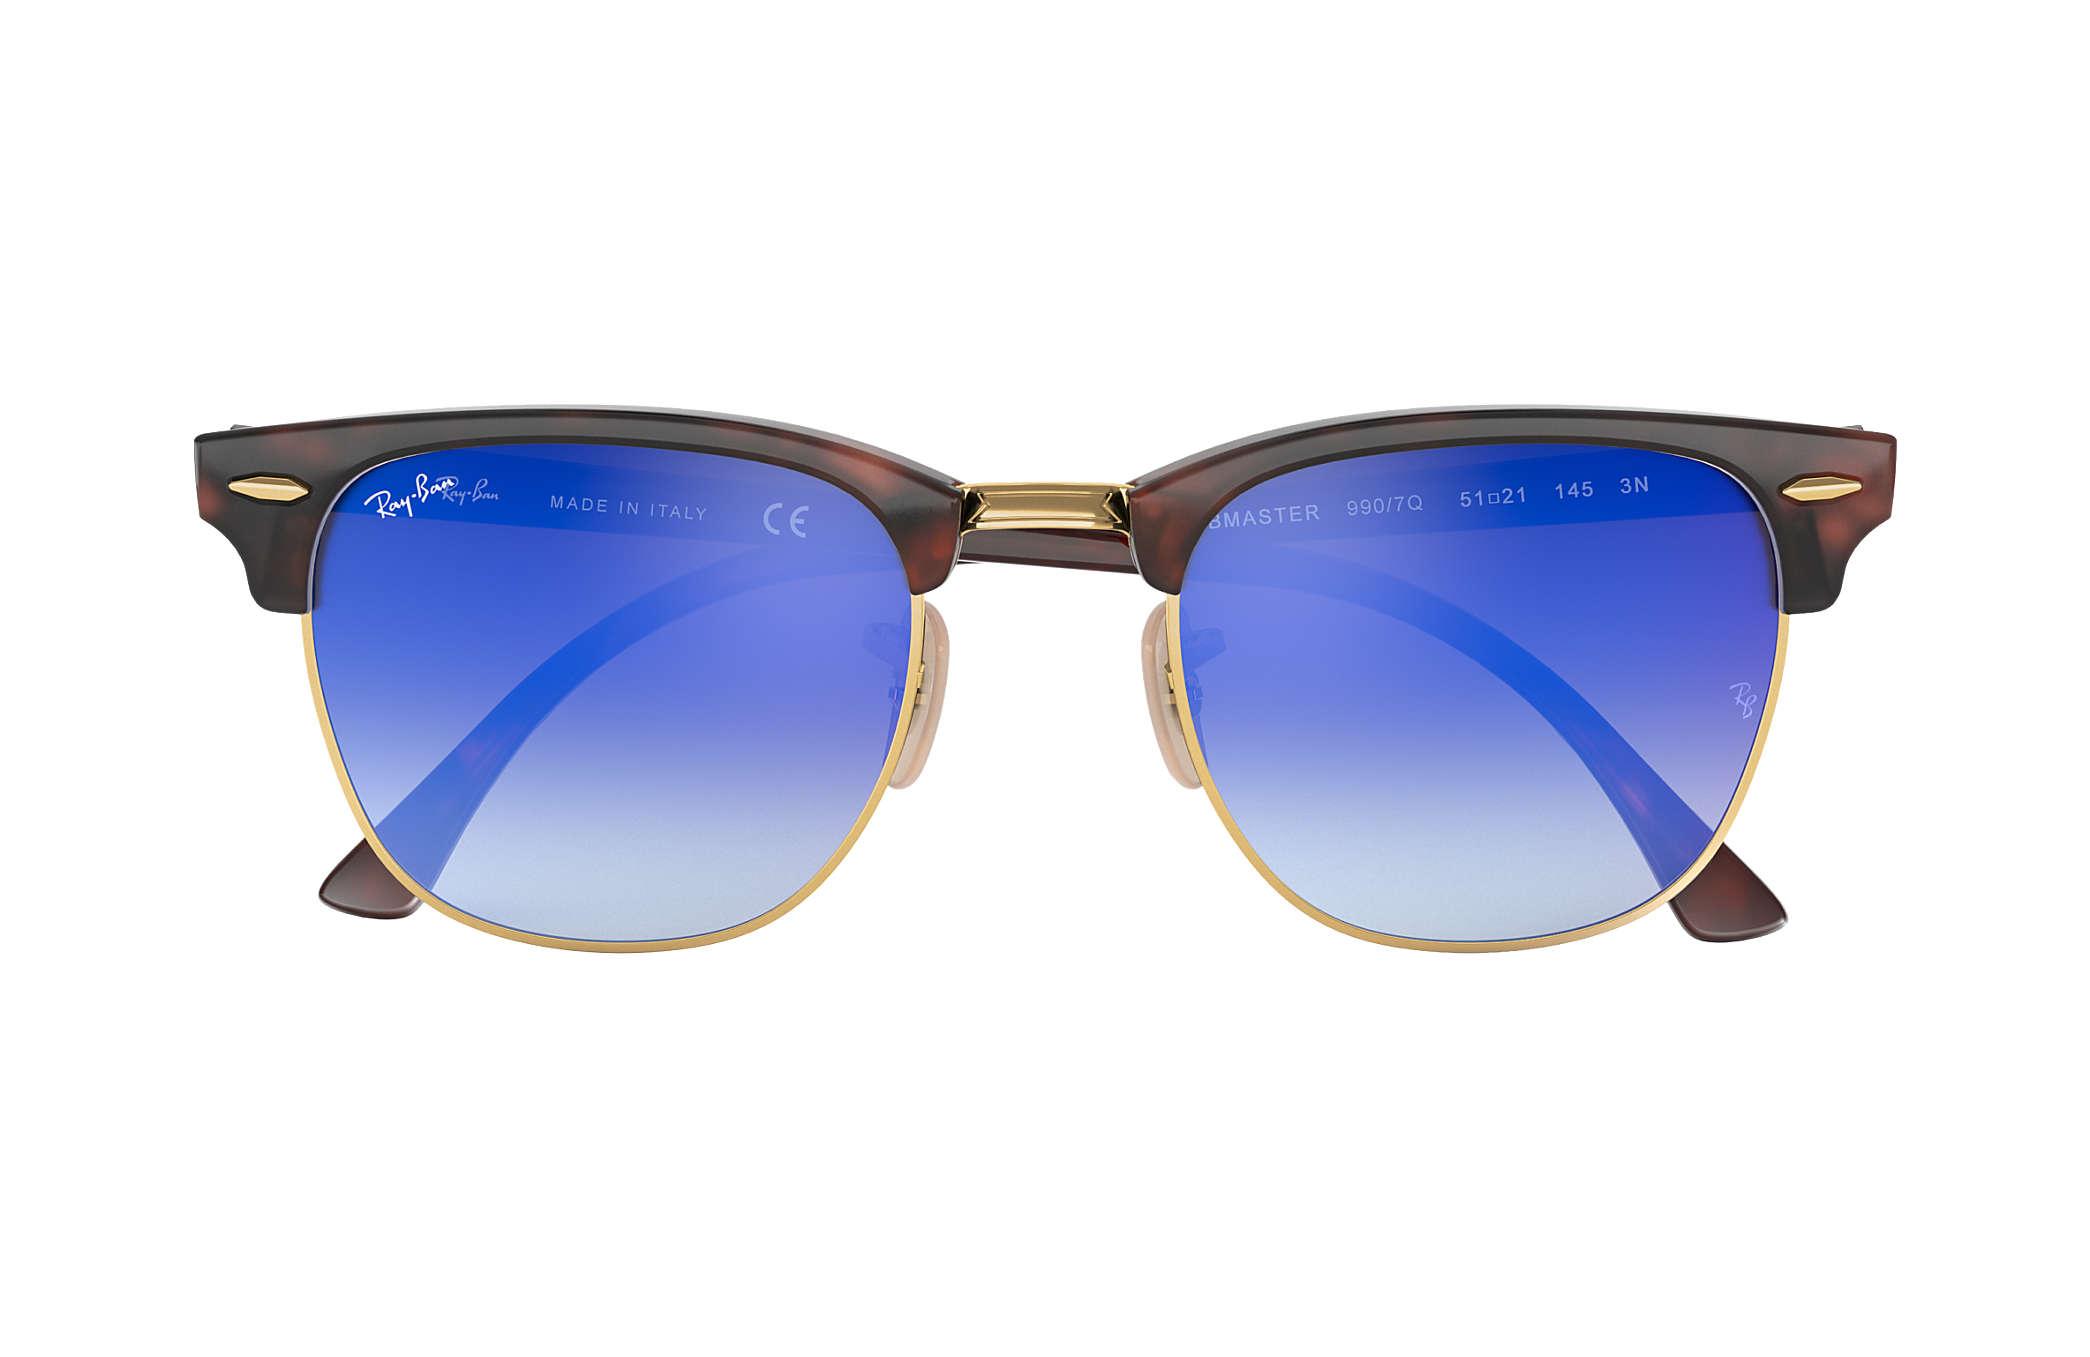 Sunglasses Hut Ray Ban Clubmaster   Louisiana Bucket Brigade 64eb2978ad